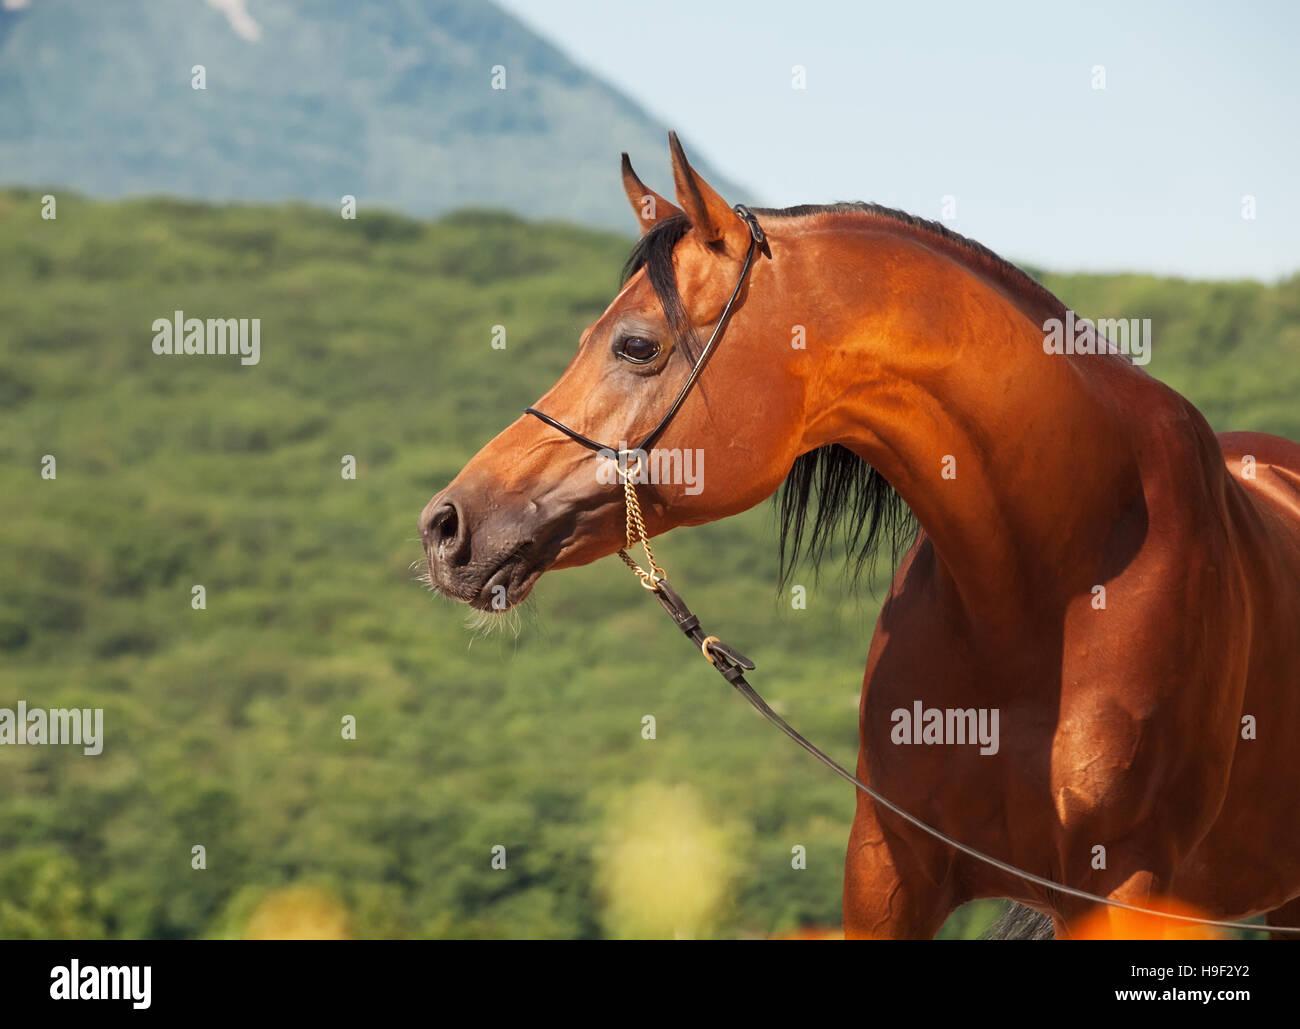 bay beautiful arabian stallion at mountain background - Stock Image